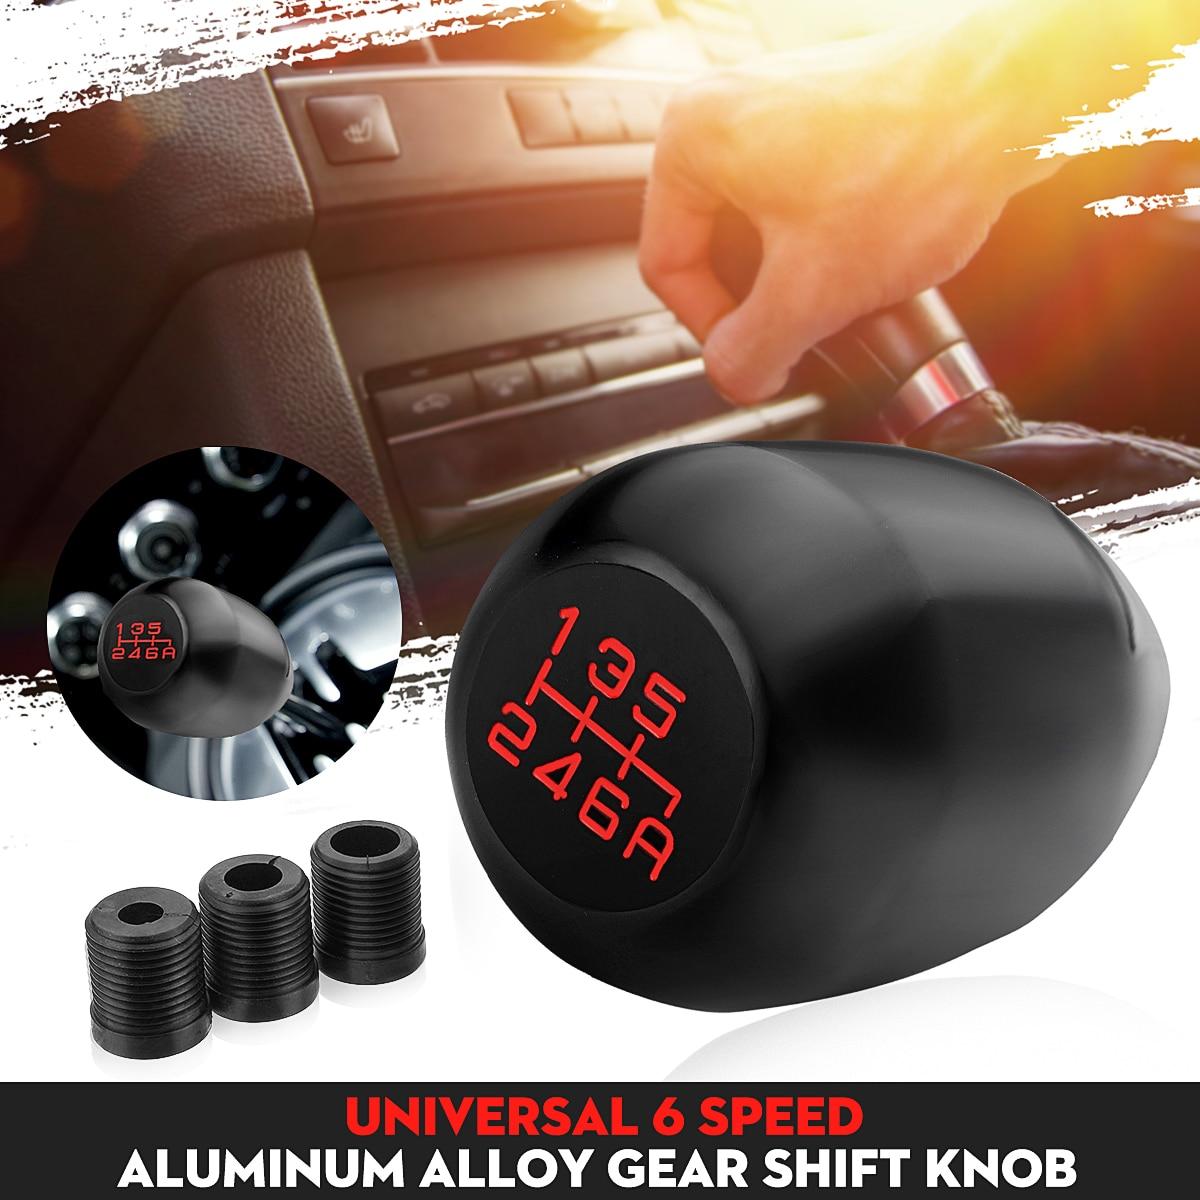 Aluminum Alloy Car 6 Speed Gear Shift Knob For Honda For